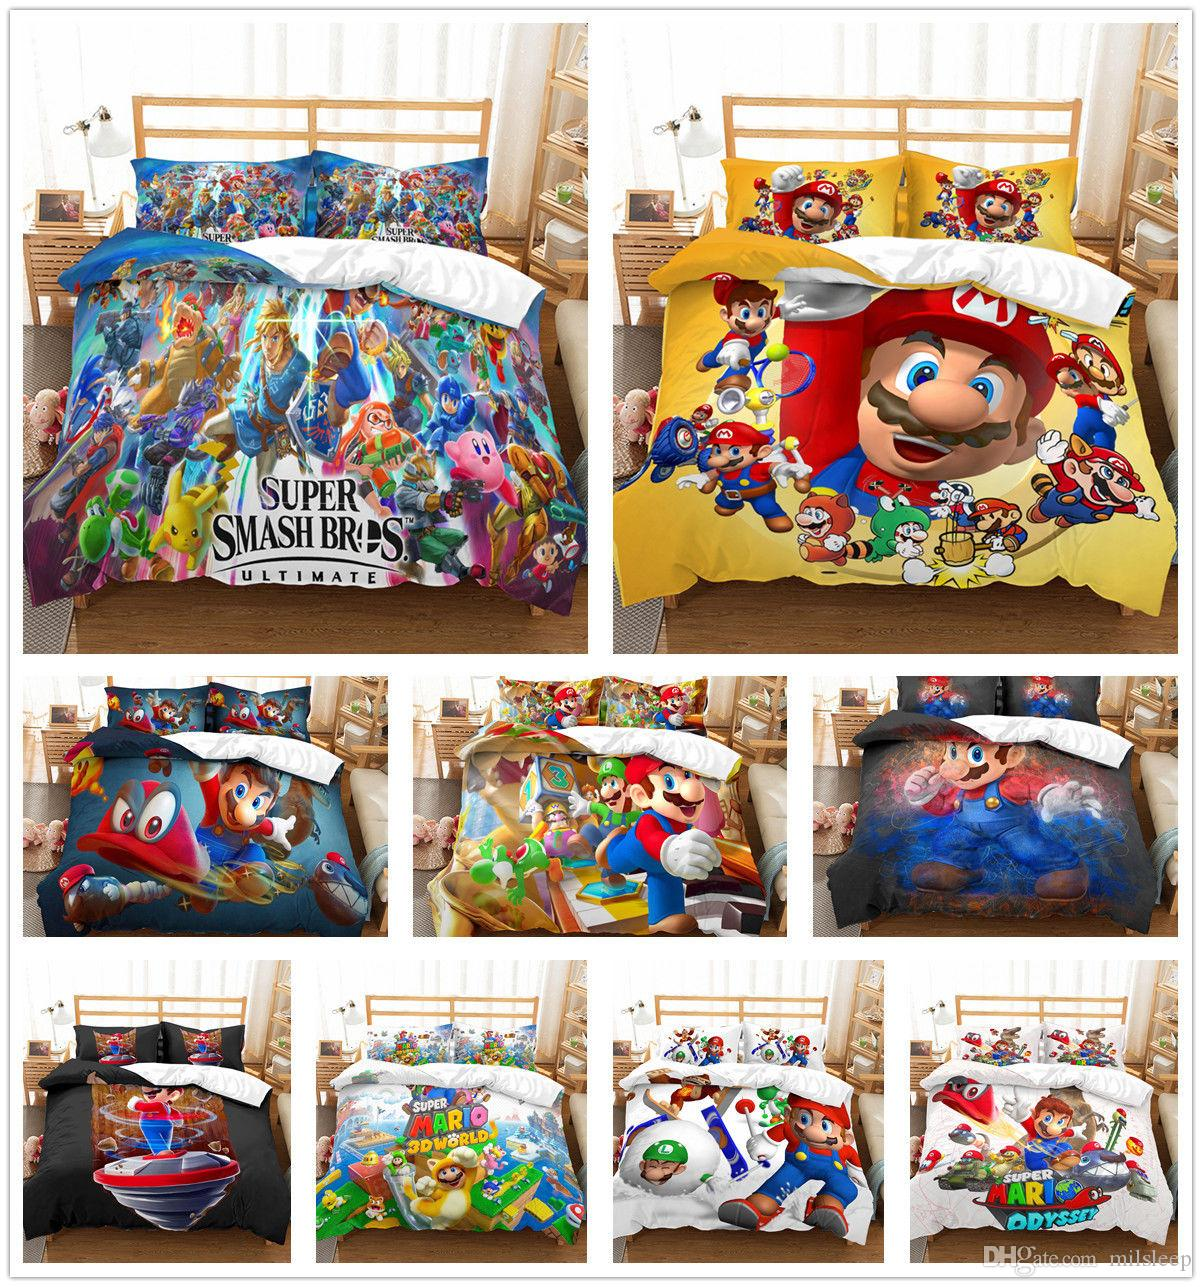 Edredon De Mario Bros.Juego De Sabanas 3d Super Mario Brothers Personalizado Funda Nordica Edredon Cubierta Para Ninos